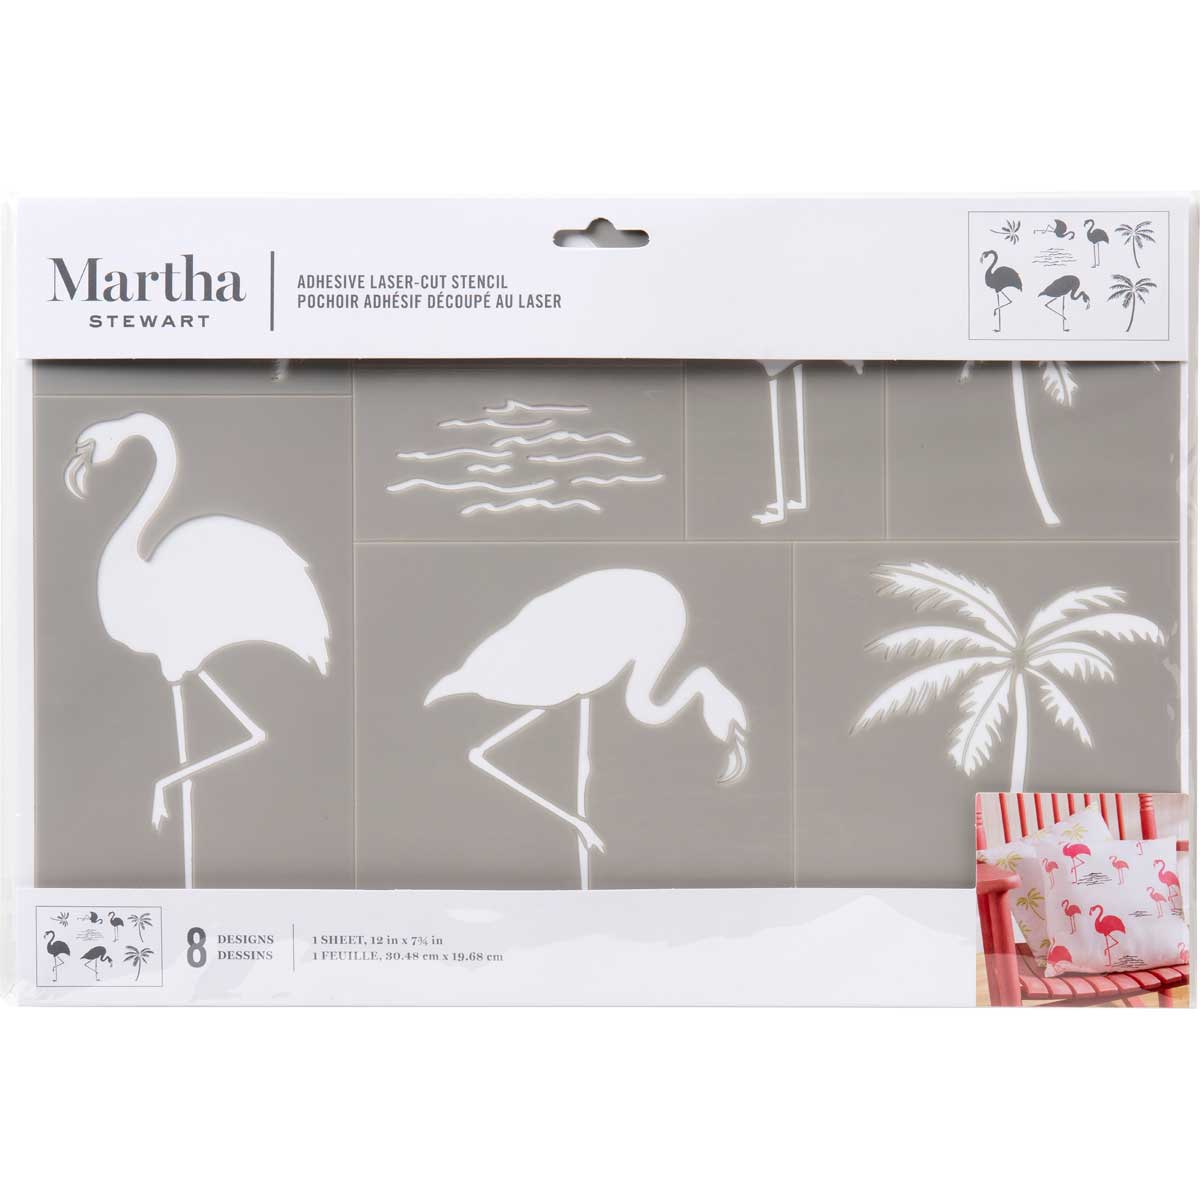 Martha Stewart ® Adhesive Stencil - Flamingo - 17638